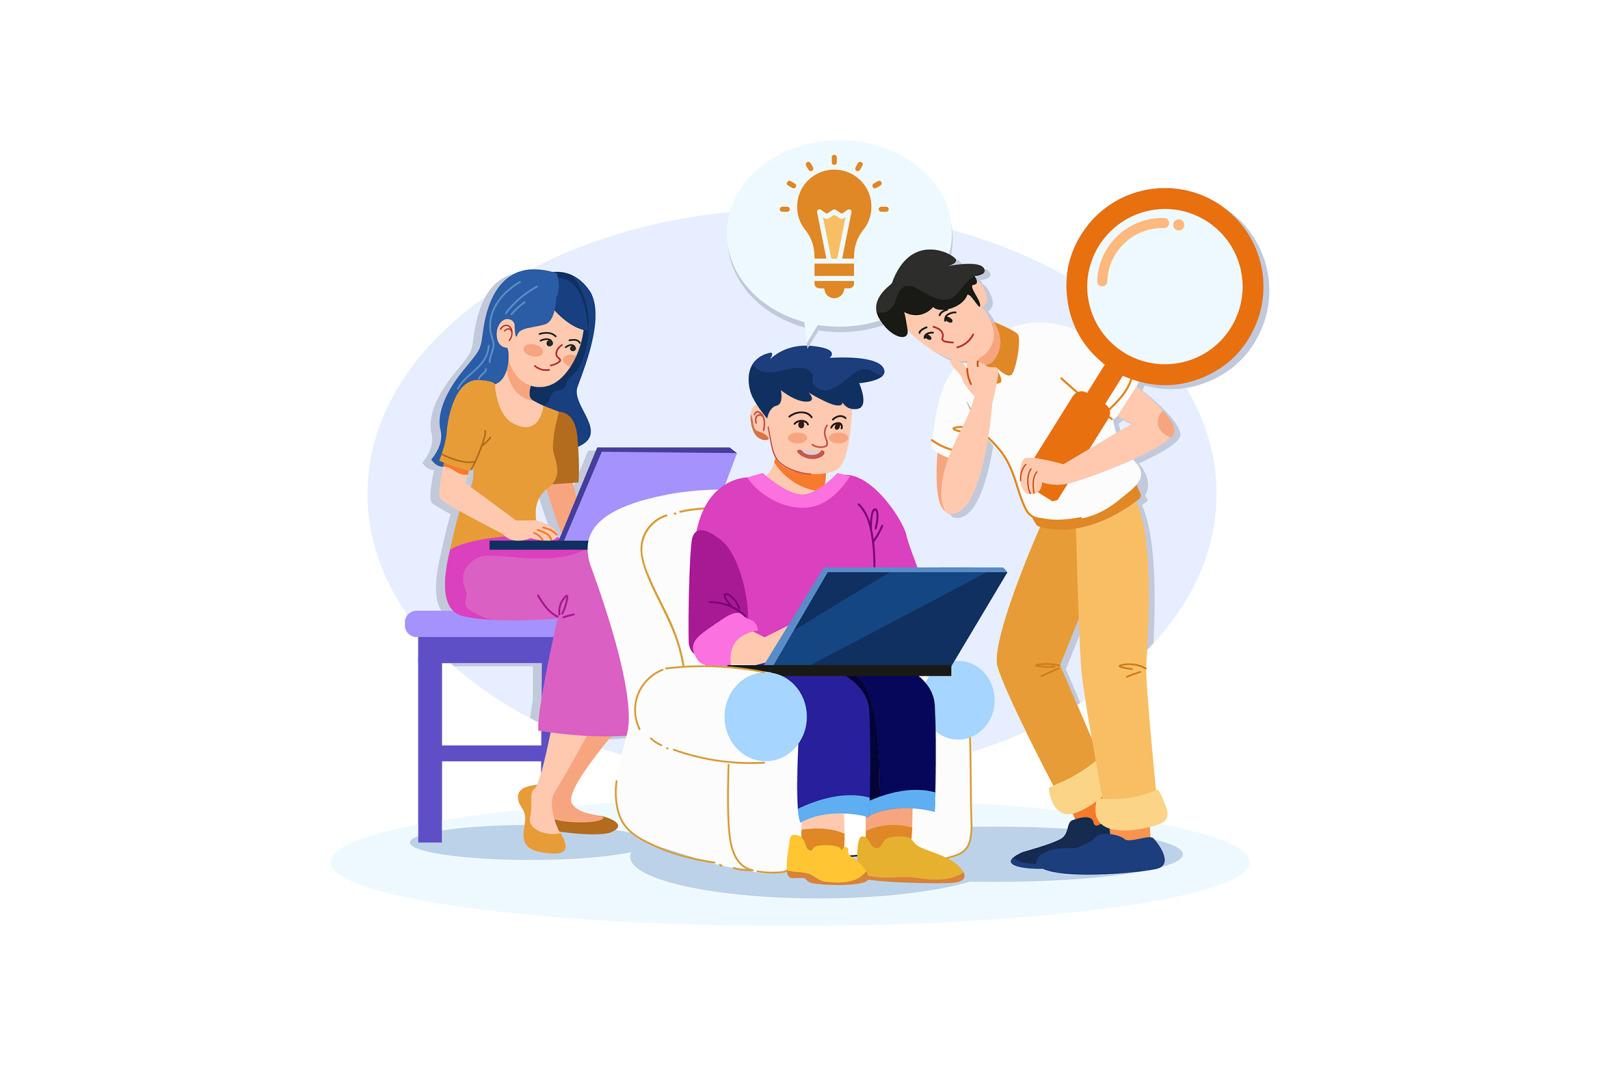 M257_ Digital Marketing Illustrations